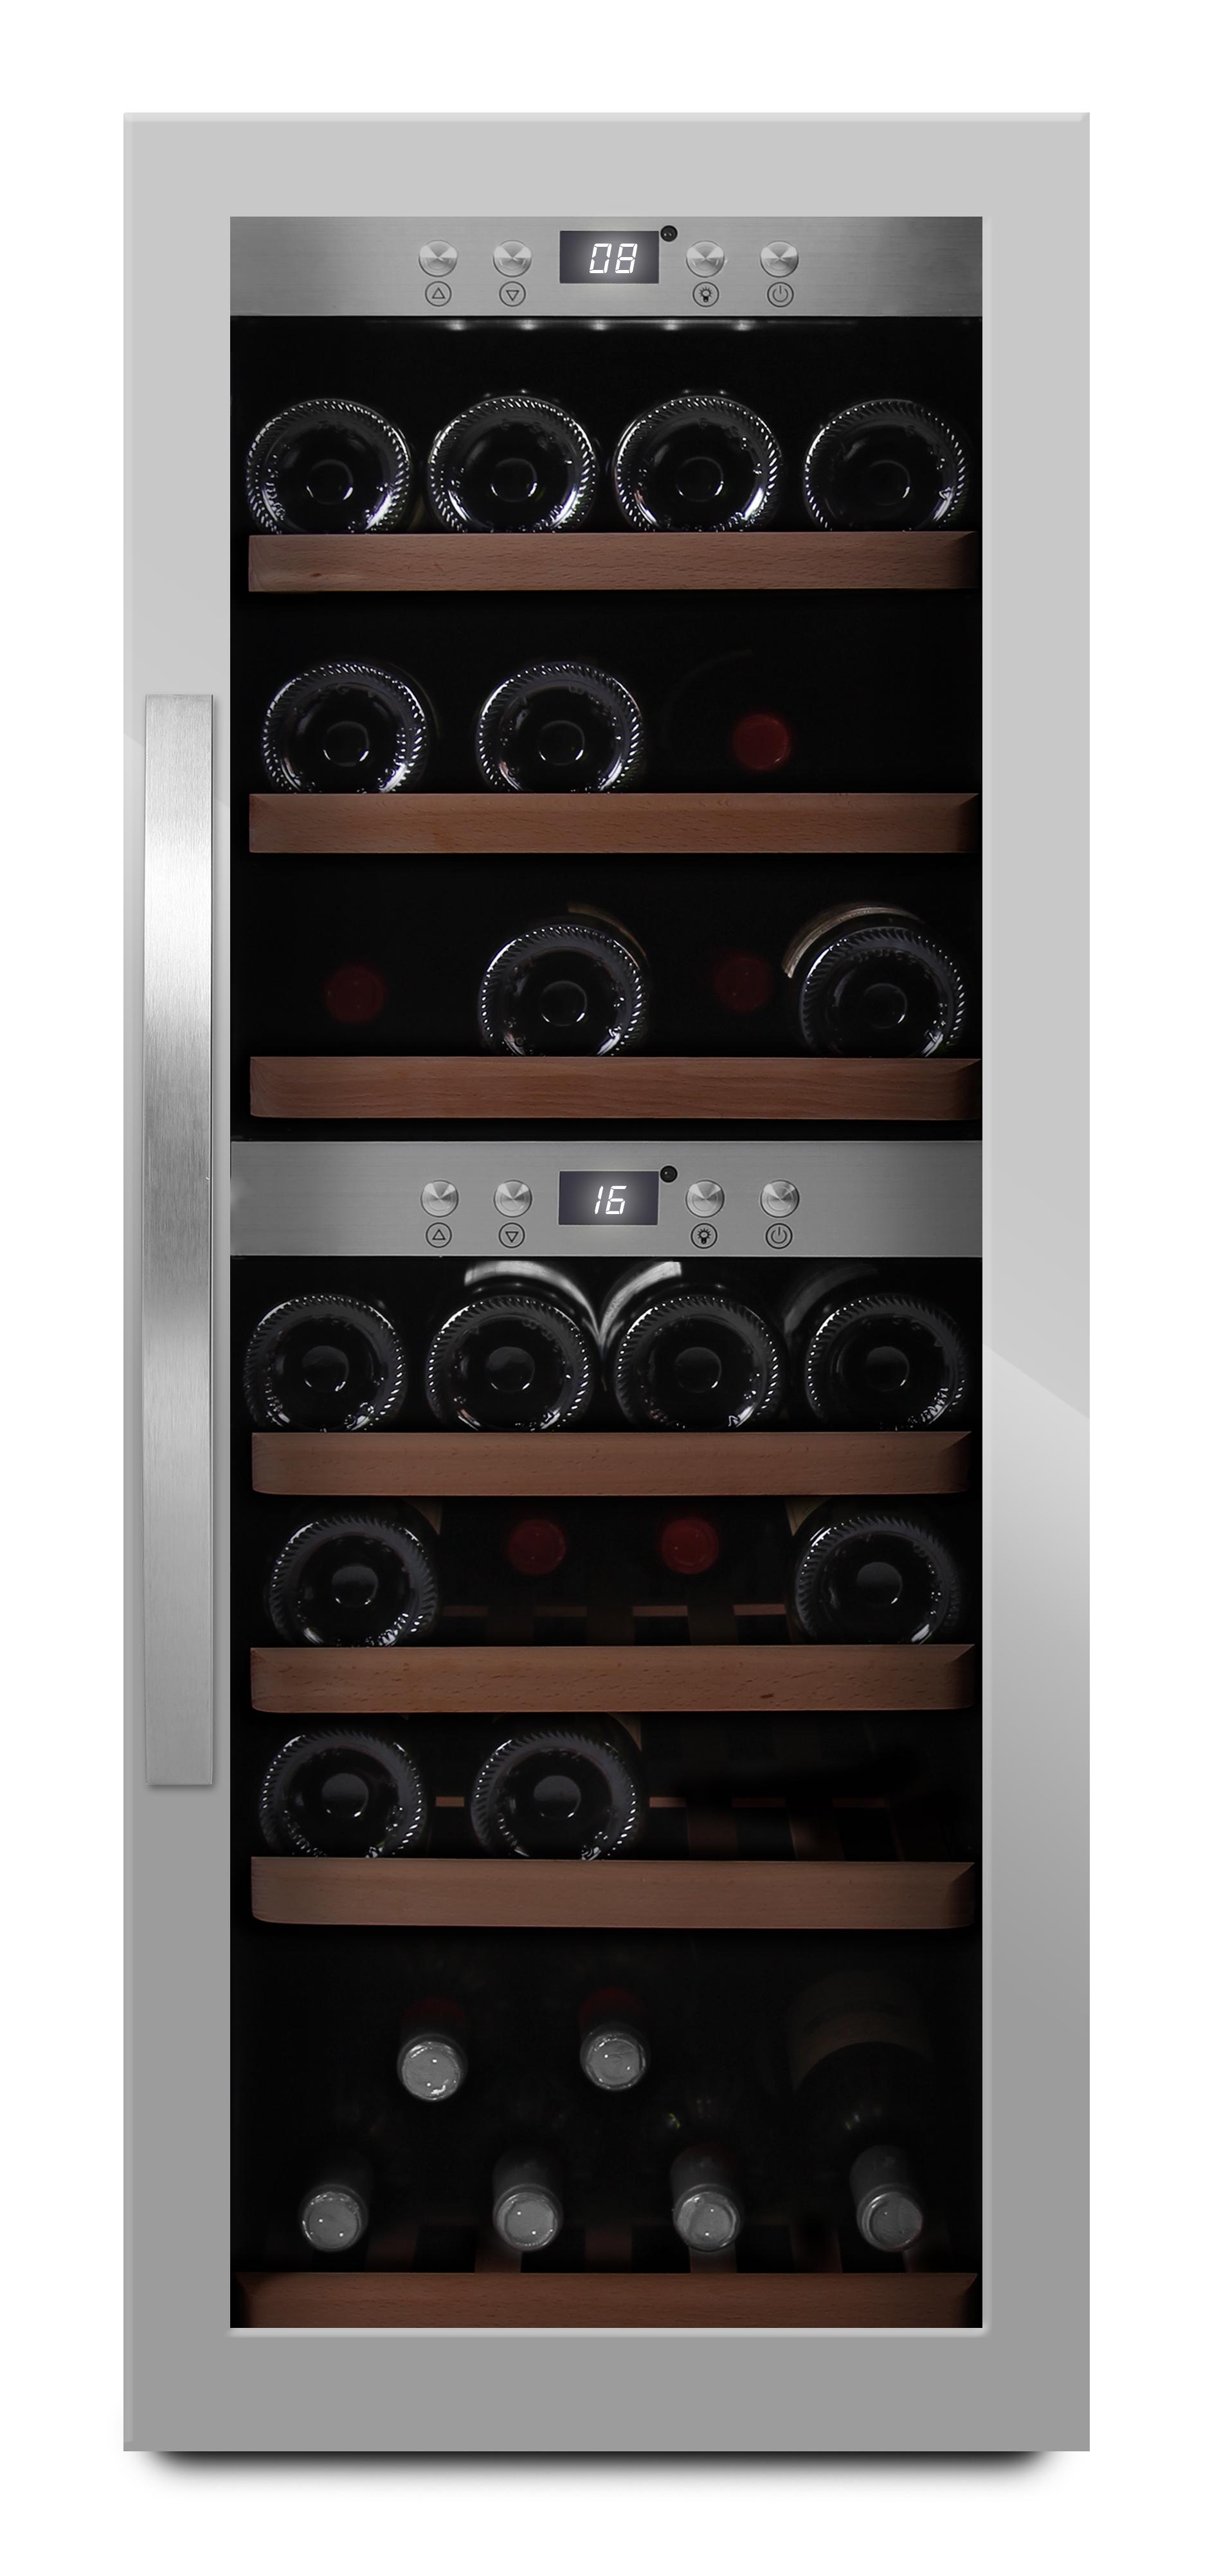 mQuvée - fristående vinkyl i rostfri design